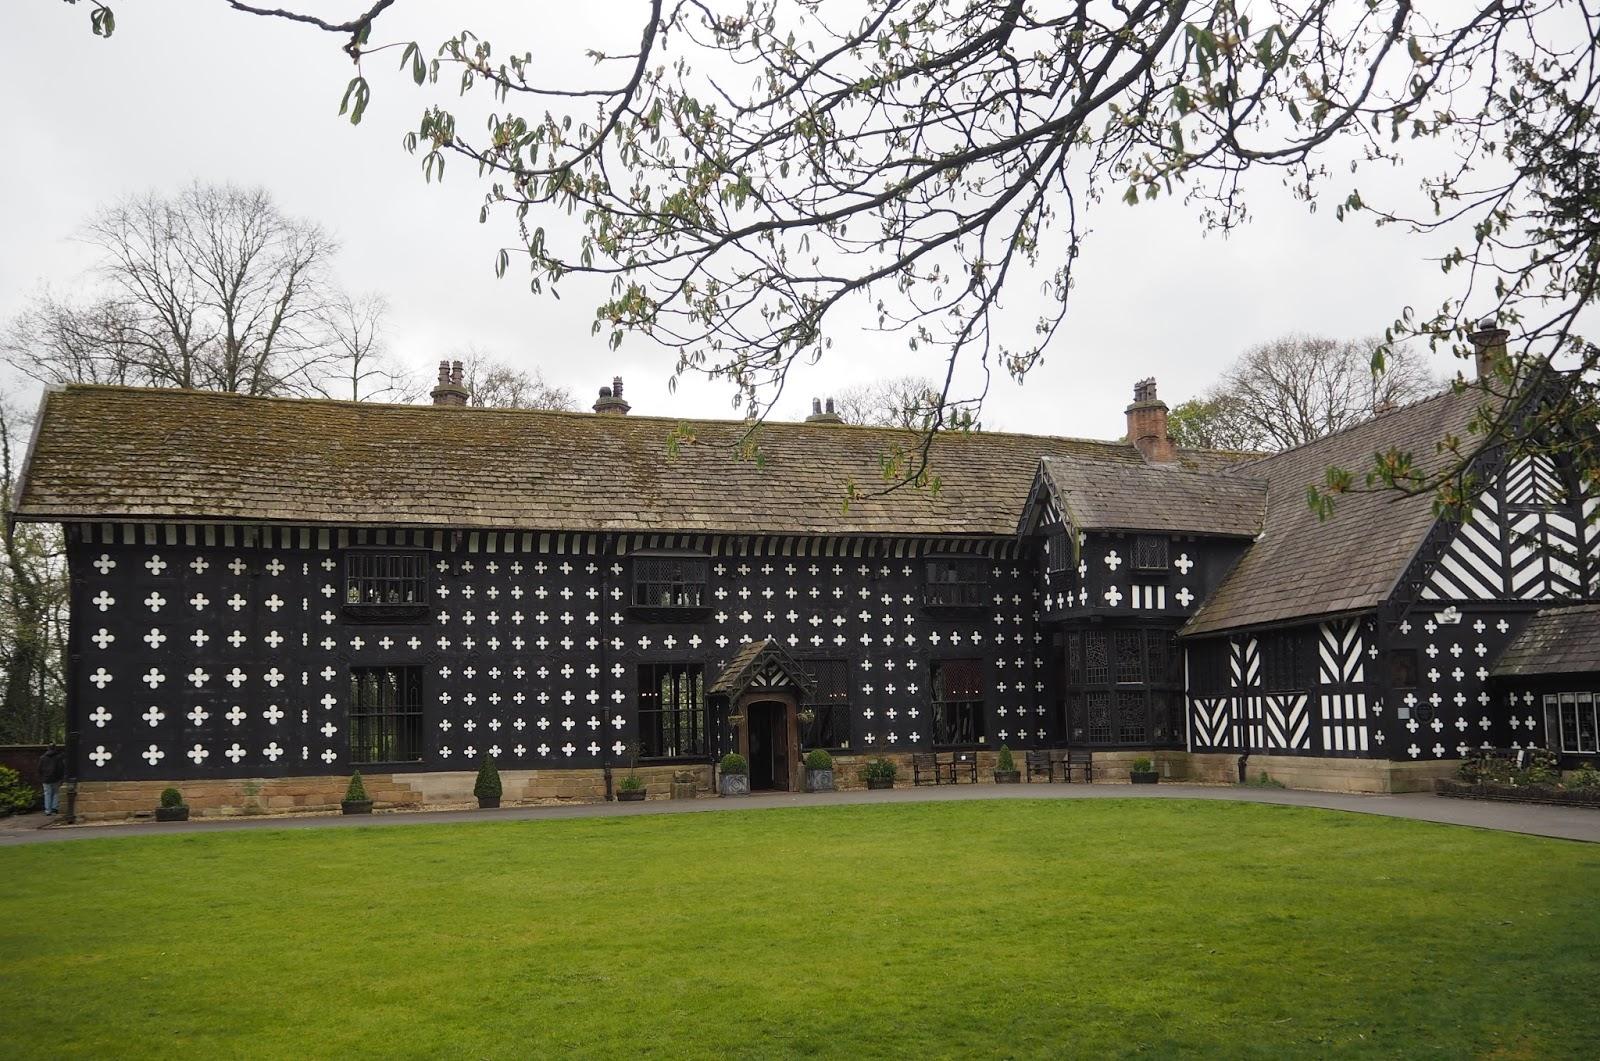 Stirk House Gisburn, Pendle Witch Tours, Samlesbury Hall, Lancashire